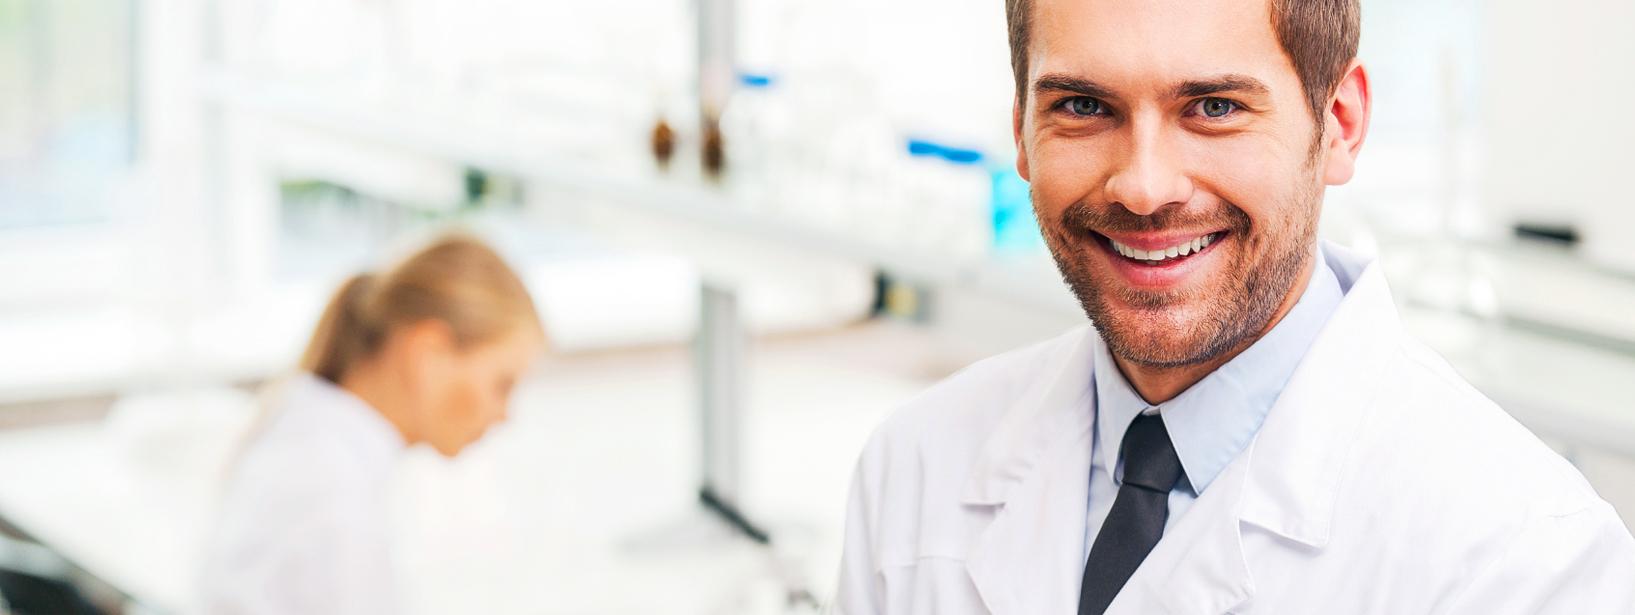 Koster Clinic Dubai - Live a healthy life